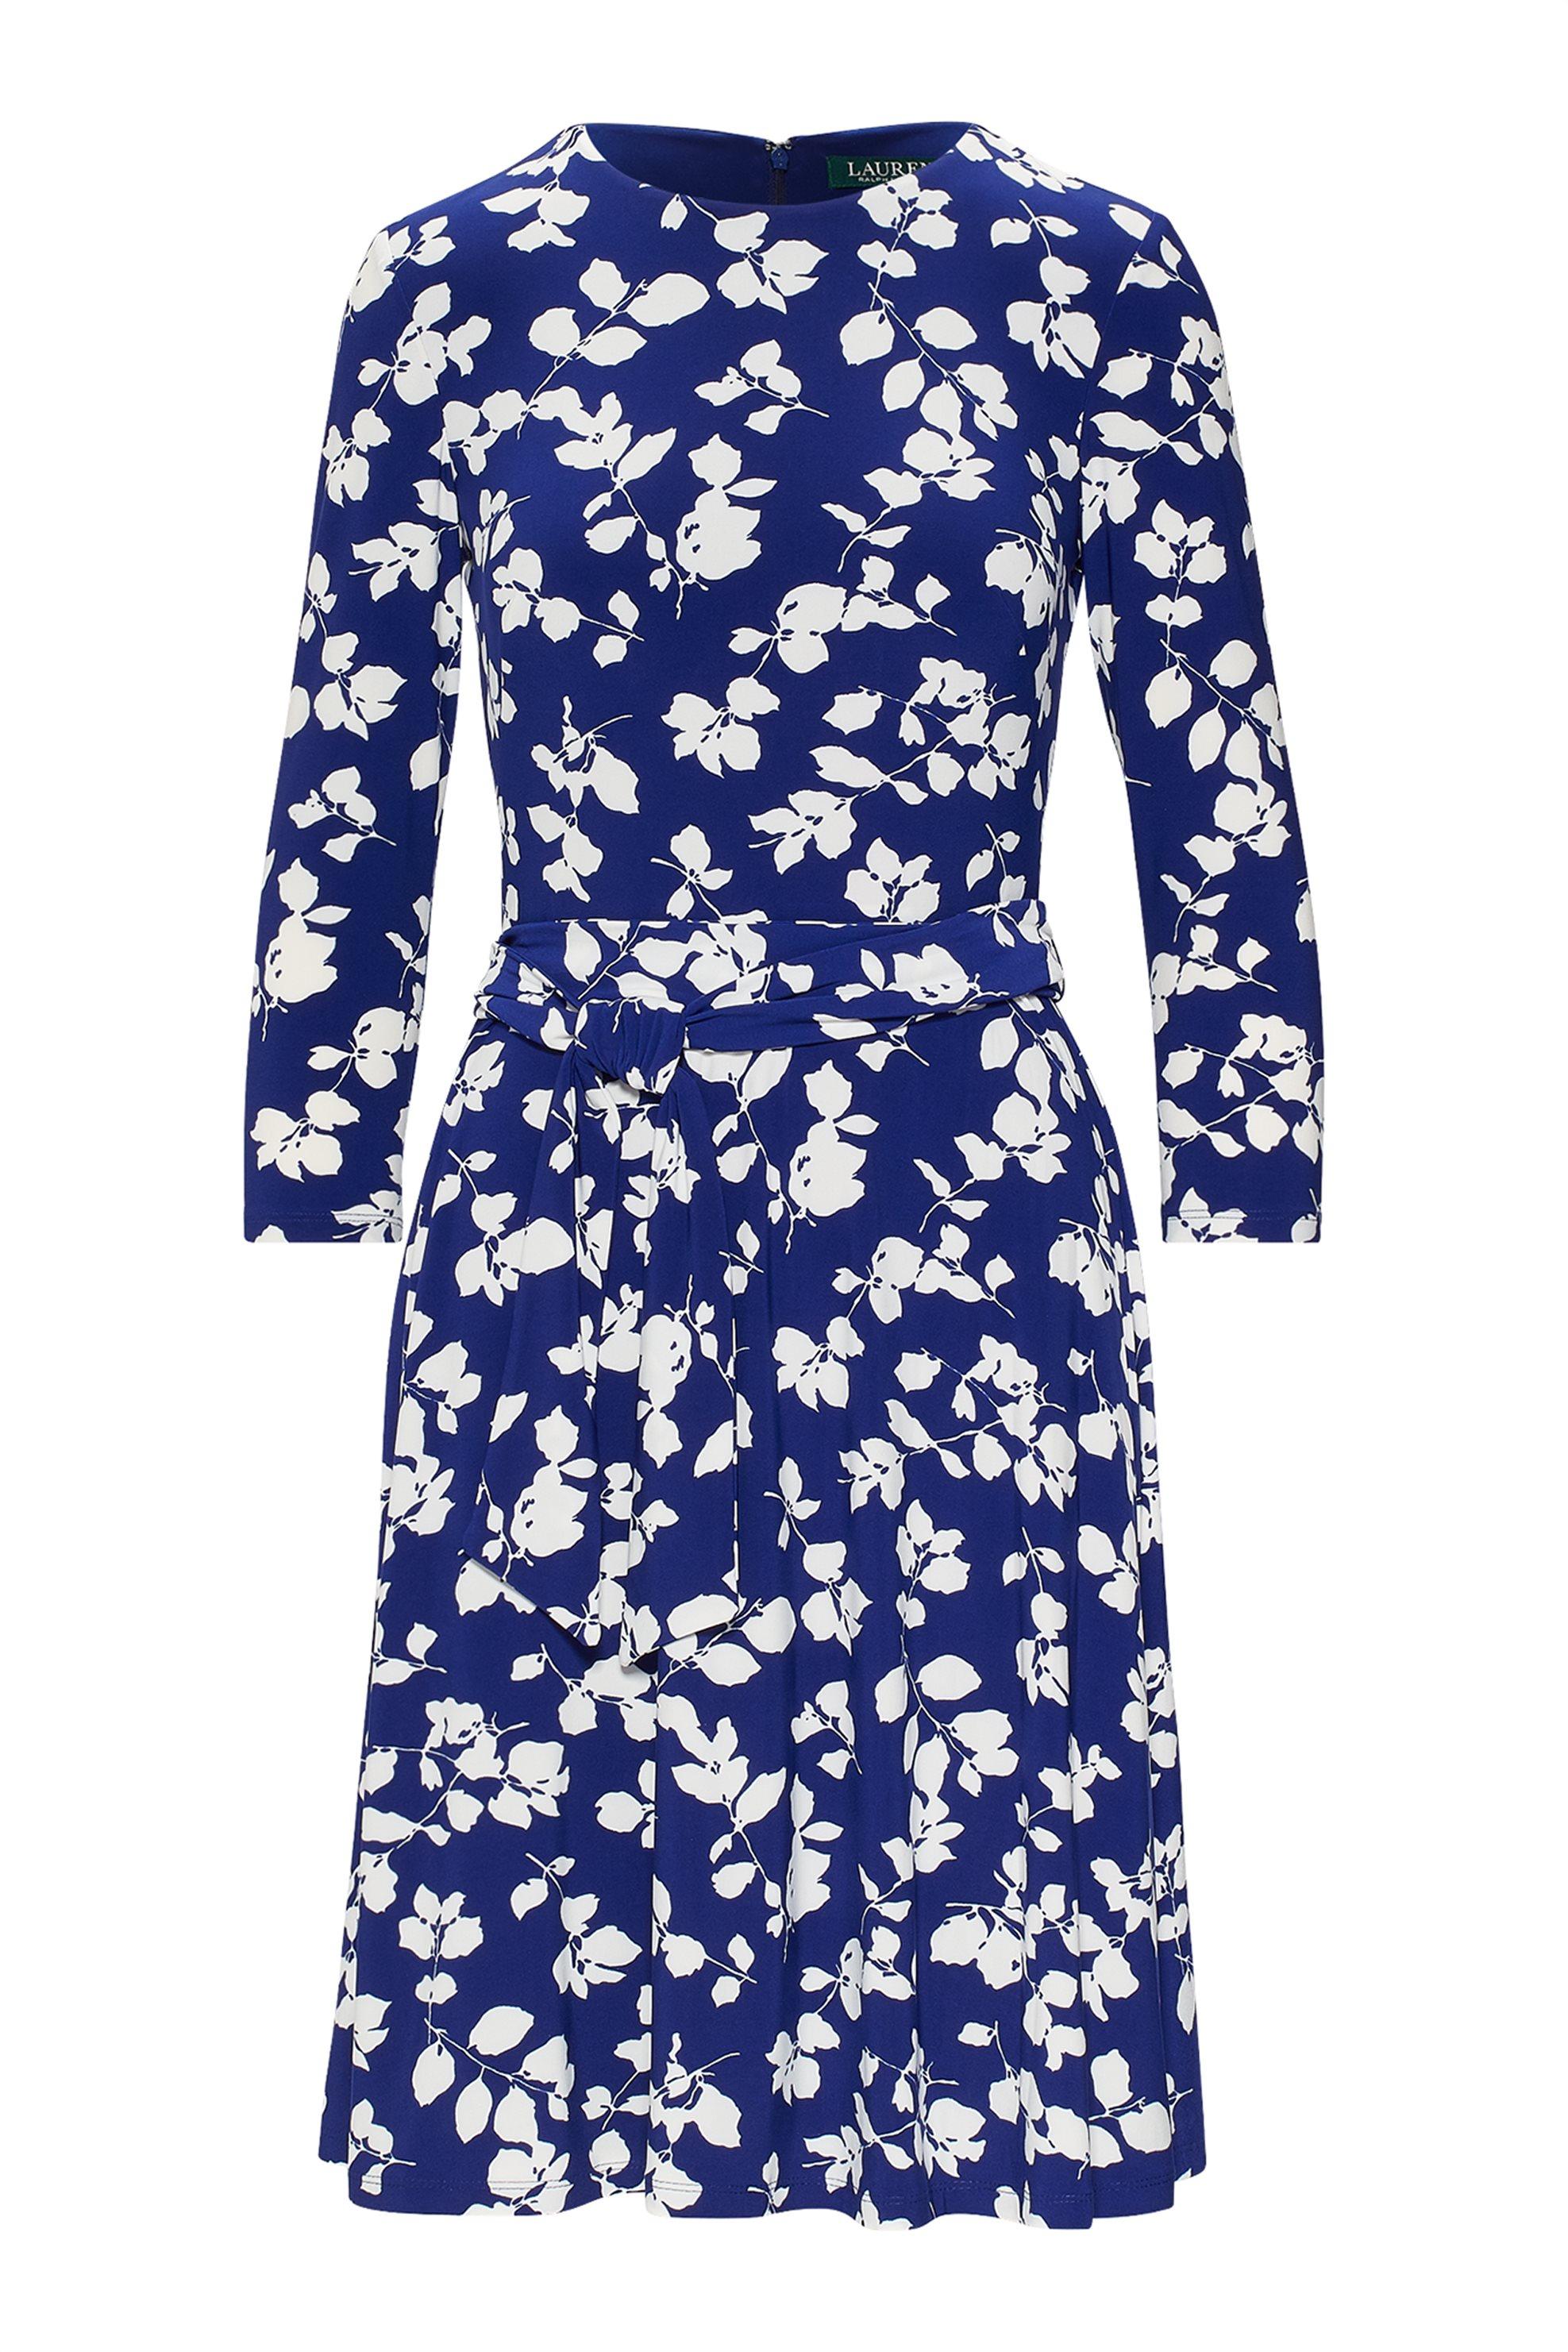 Lauren Ralph Lauren γυναικείo φόρεμα Floral Fit-and-Flare - 250740986001 - Μπλε  γυναικα   ρουχα   φορέματα   midi φορέματα